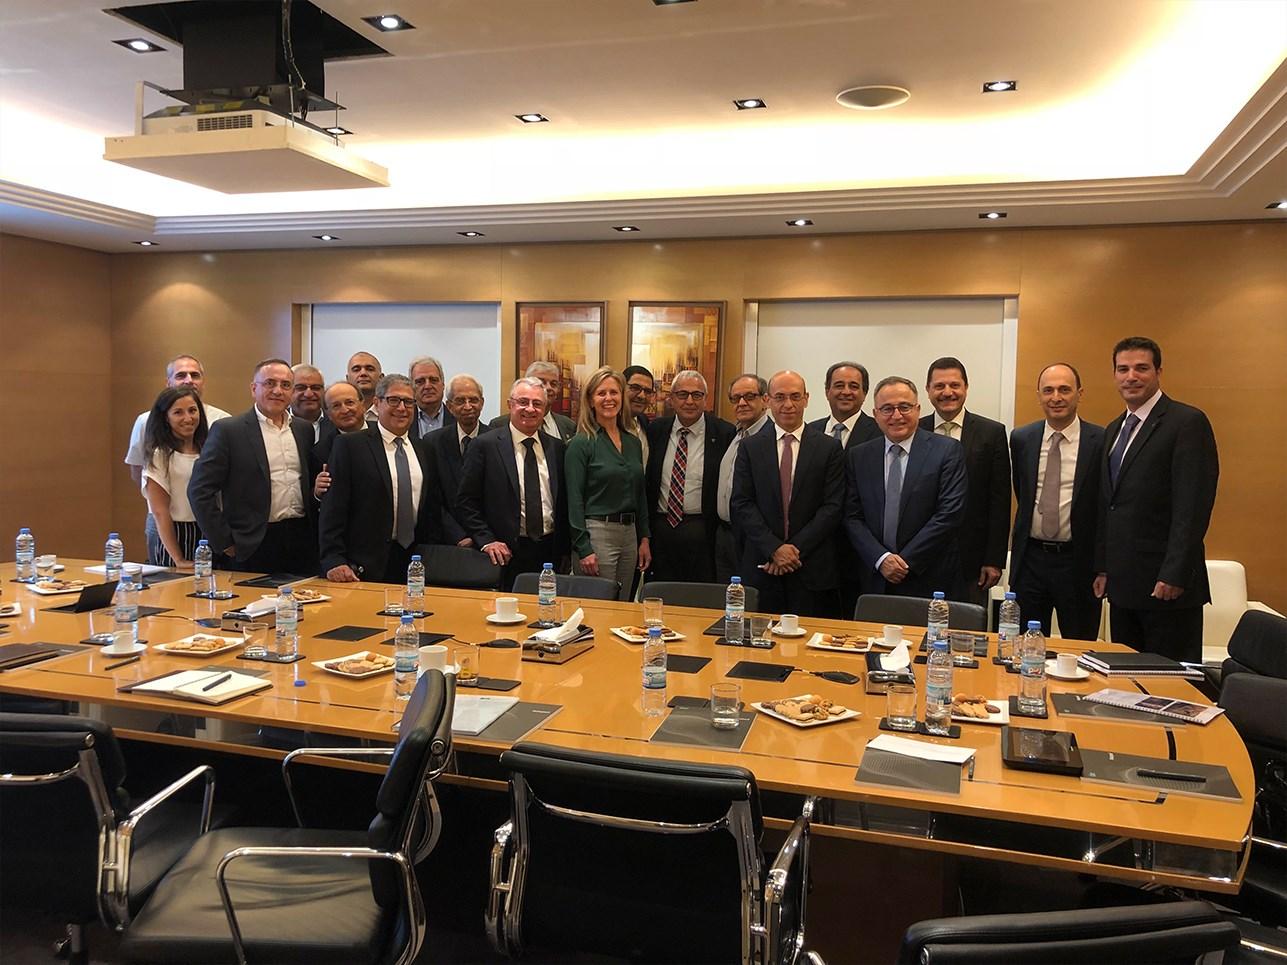 American Society of Civil Engineers President Kristina L. Swallow Visits Dar Premises